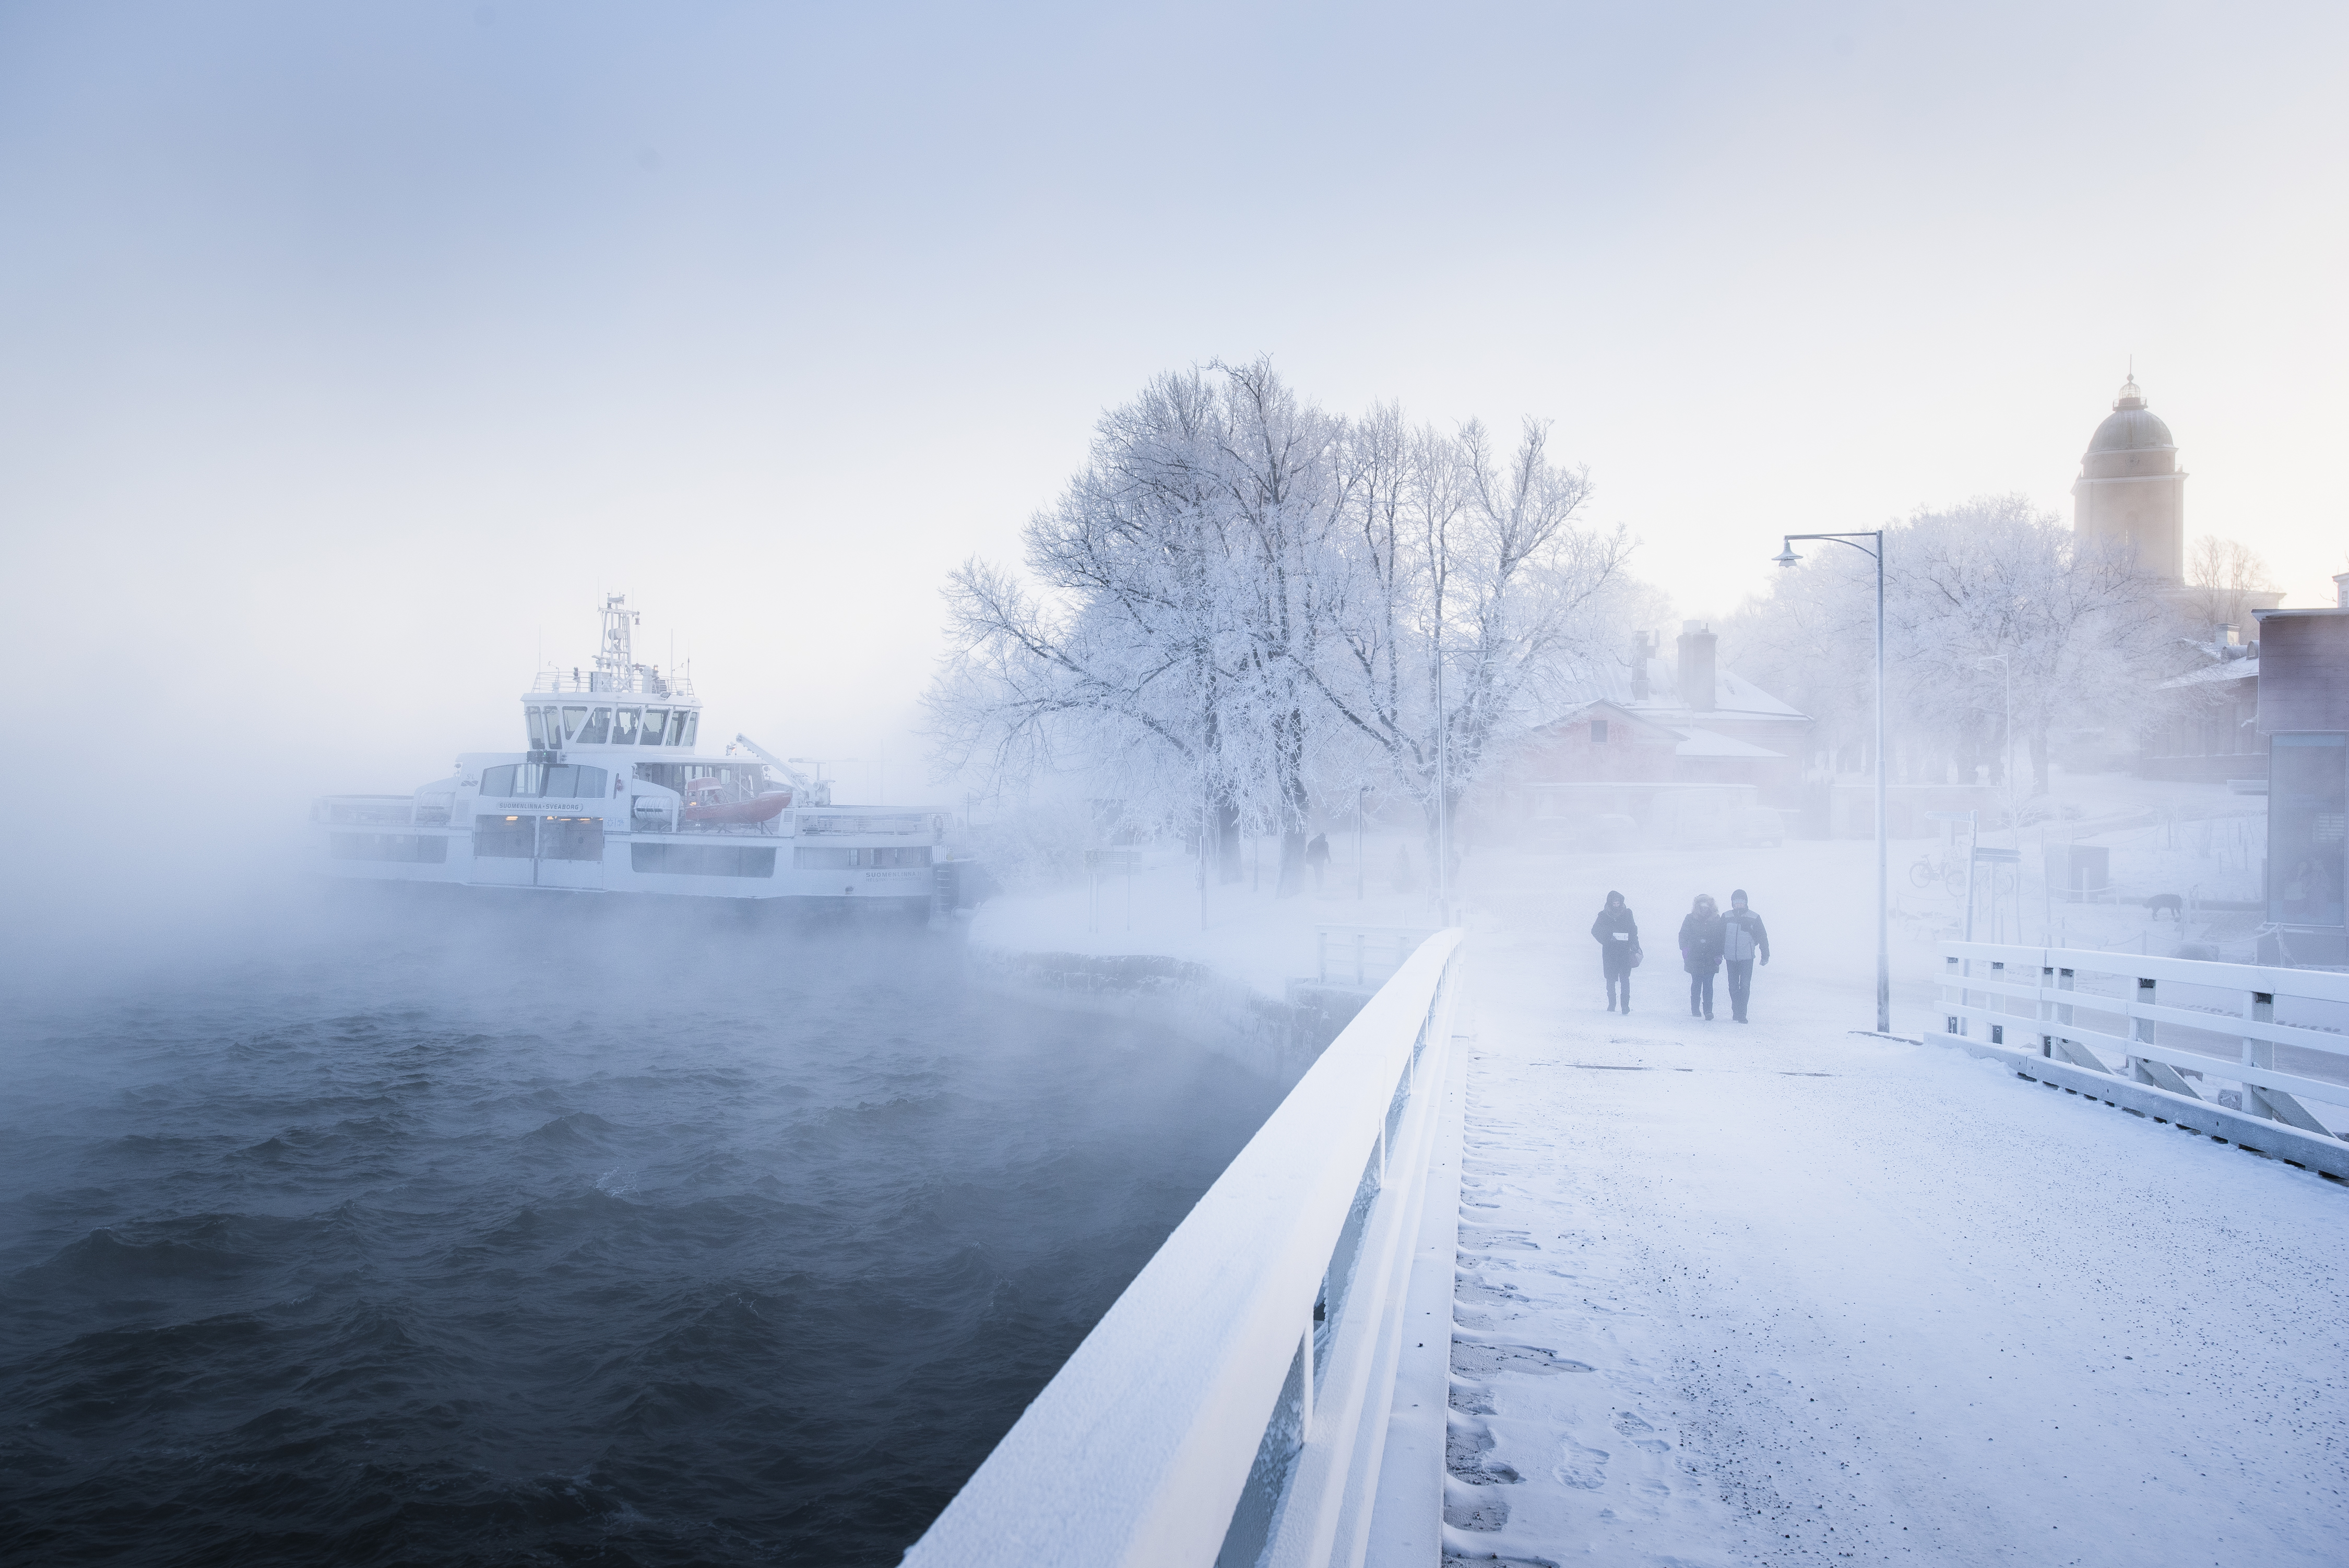 Suomenlinna_governing body of Suomenlinna